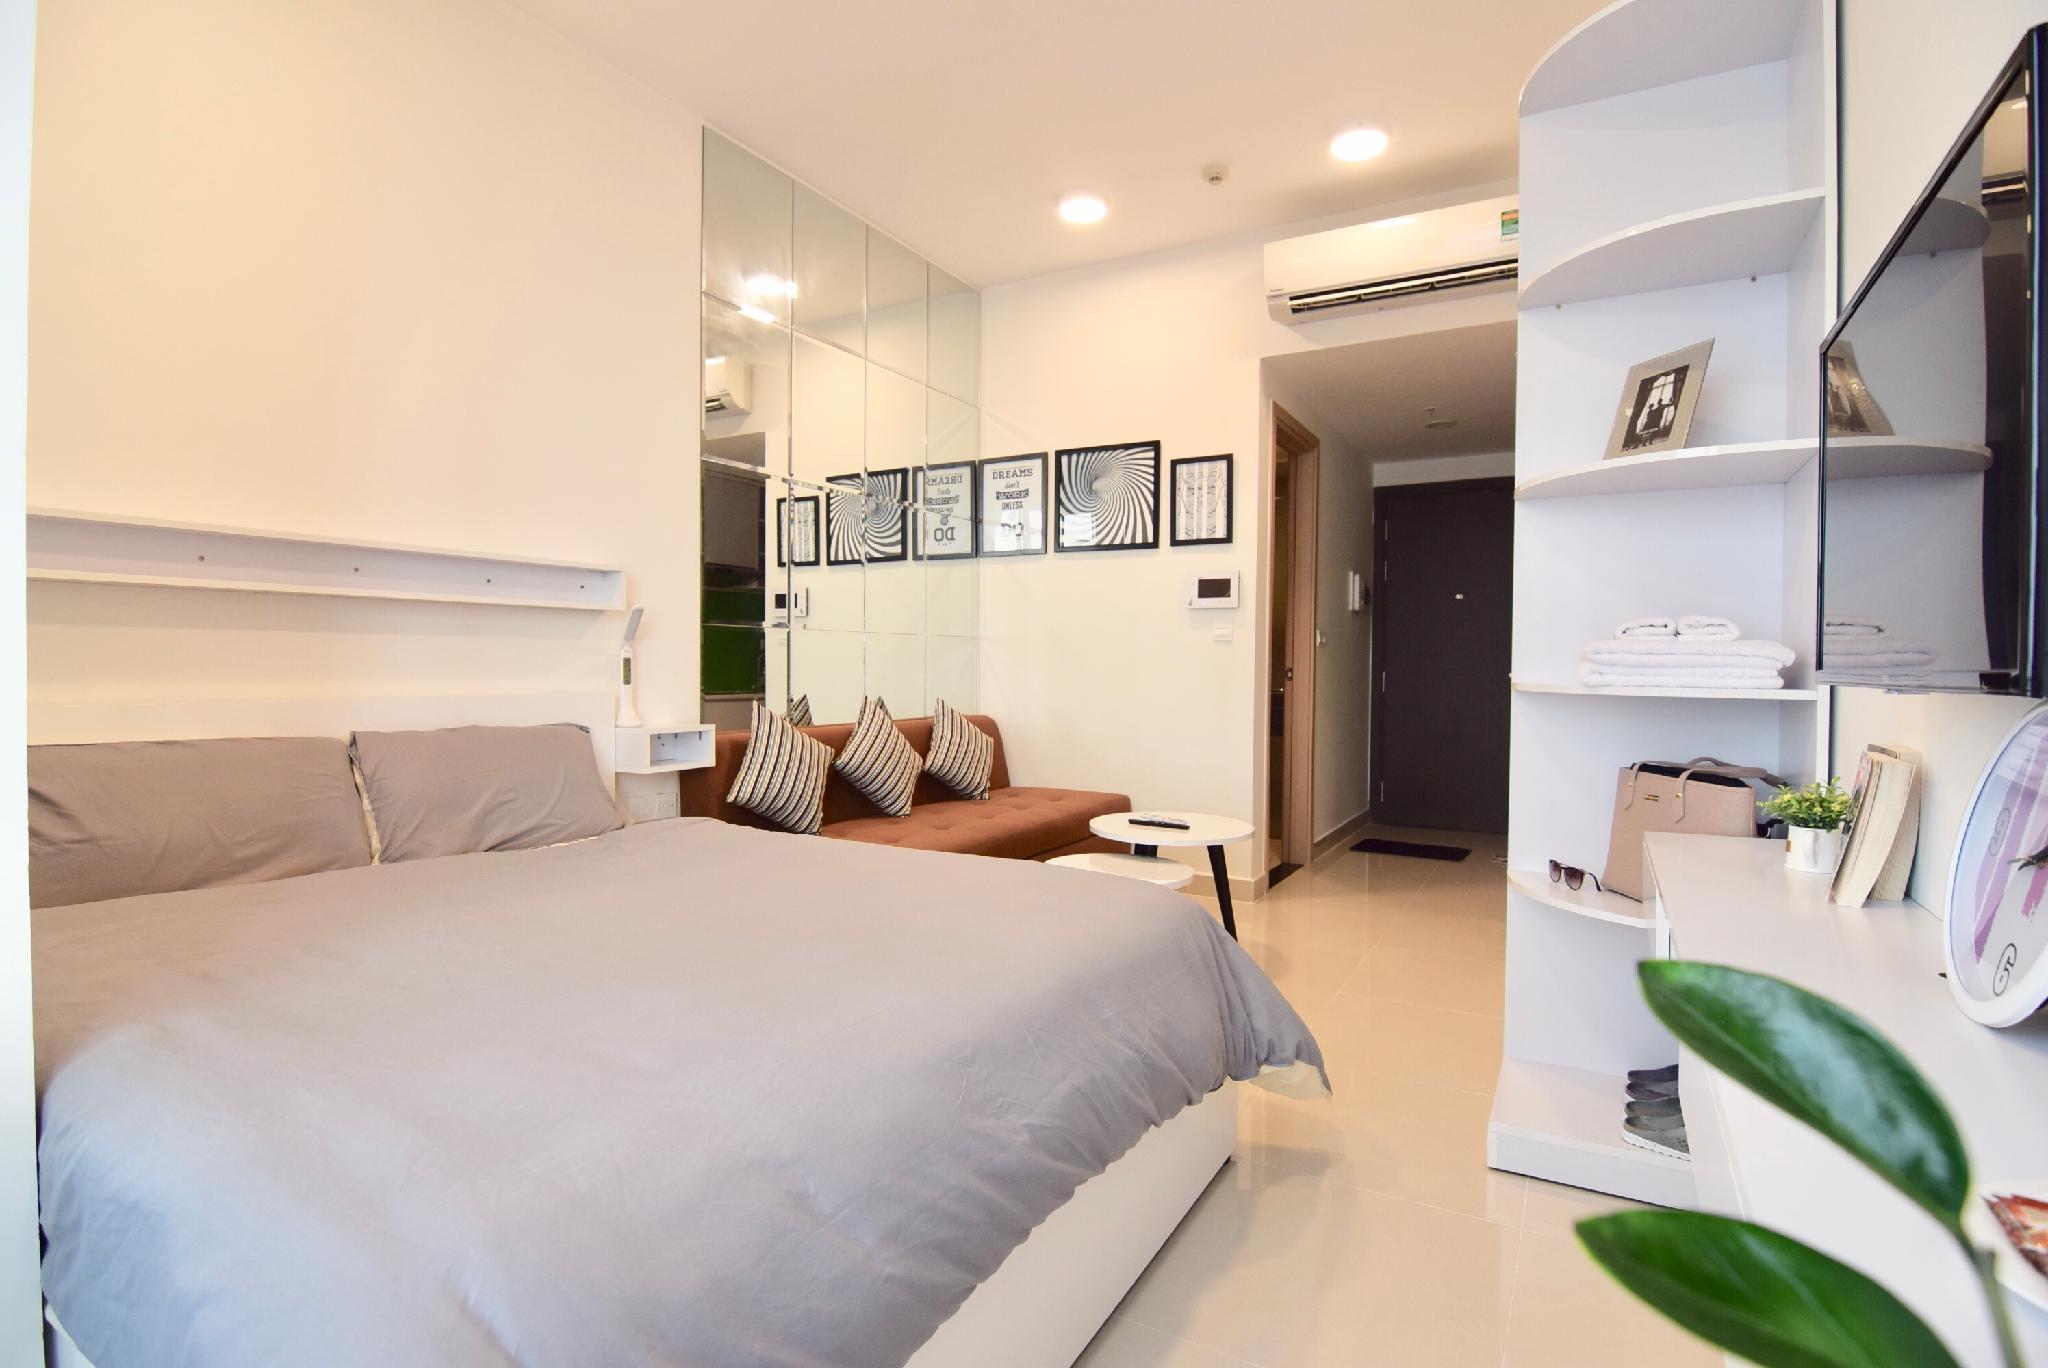 Chau Apartment Ben Thanh FREE Pool Gym Netflix